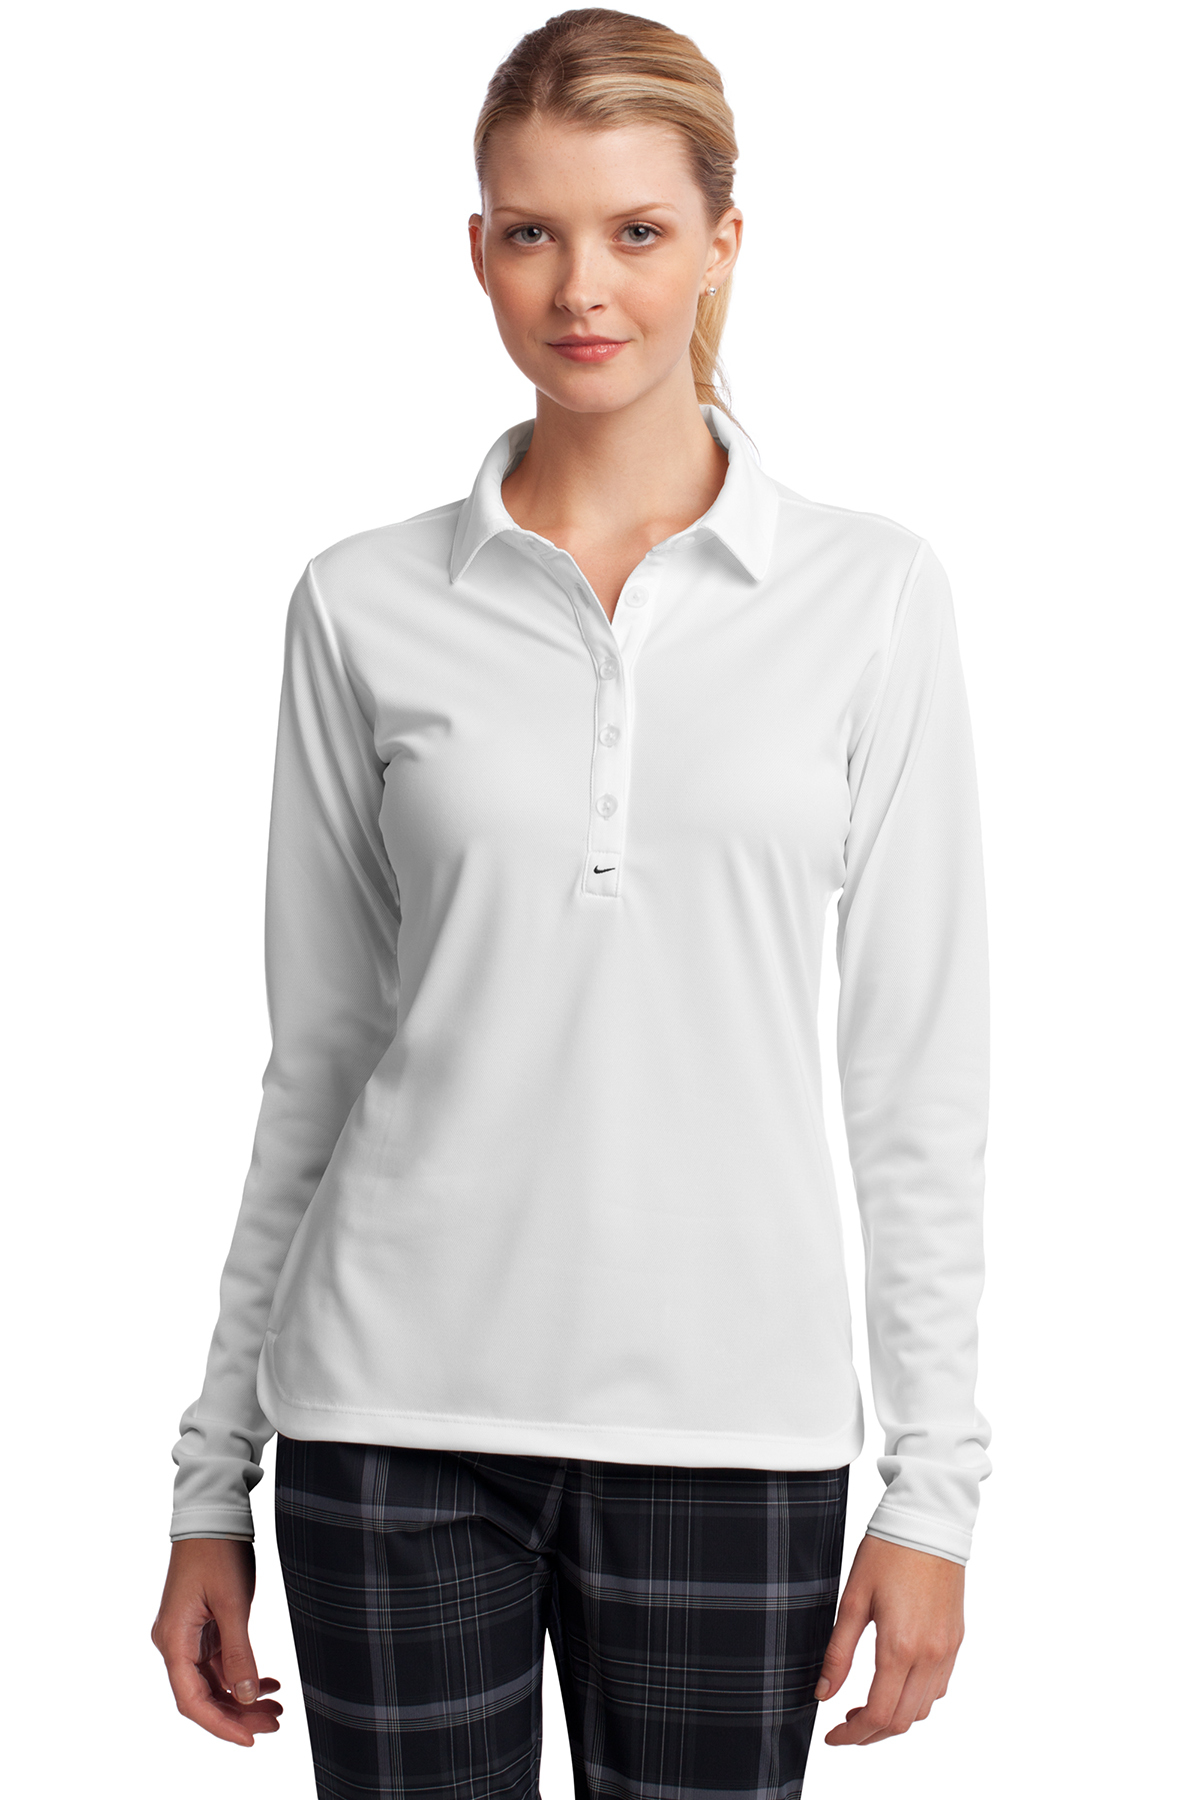 a097e9a045b3 Nike Ladies Long Sleeve Dri-FIT Stretch Tech Polo